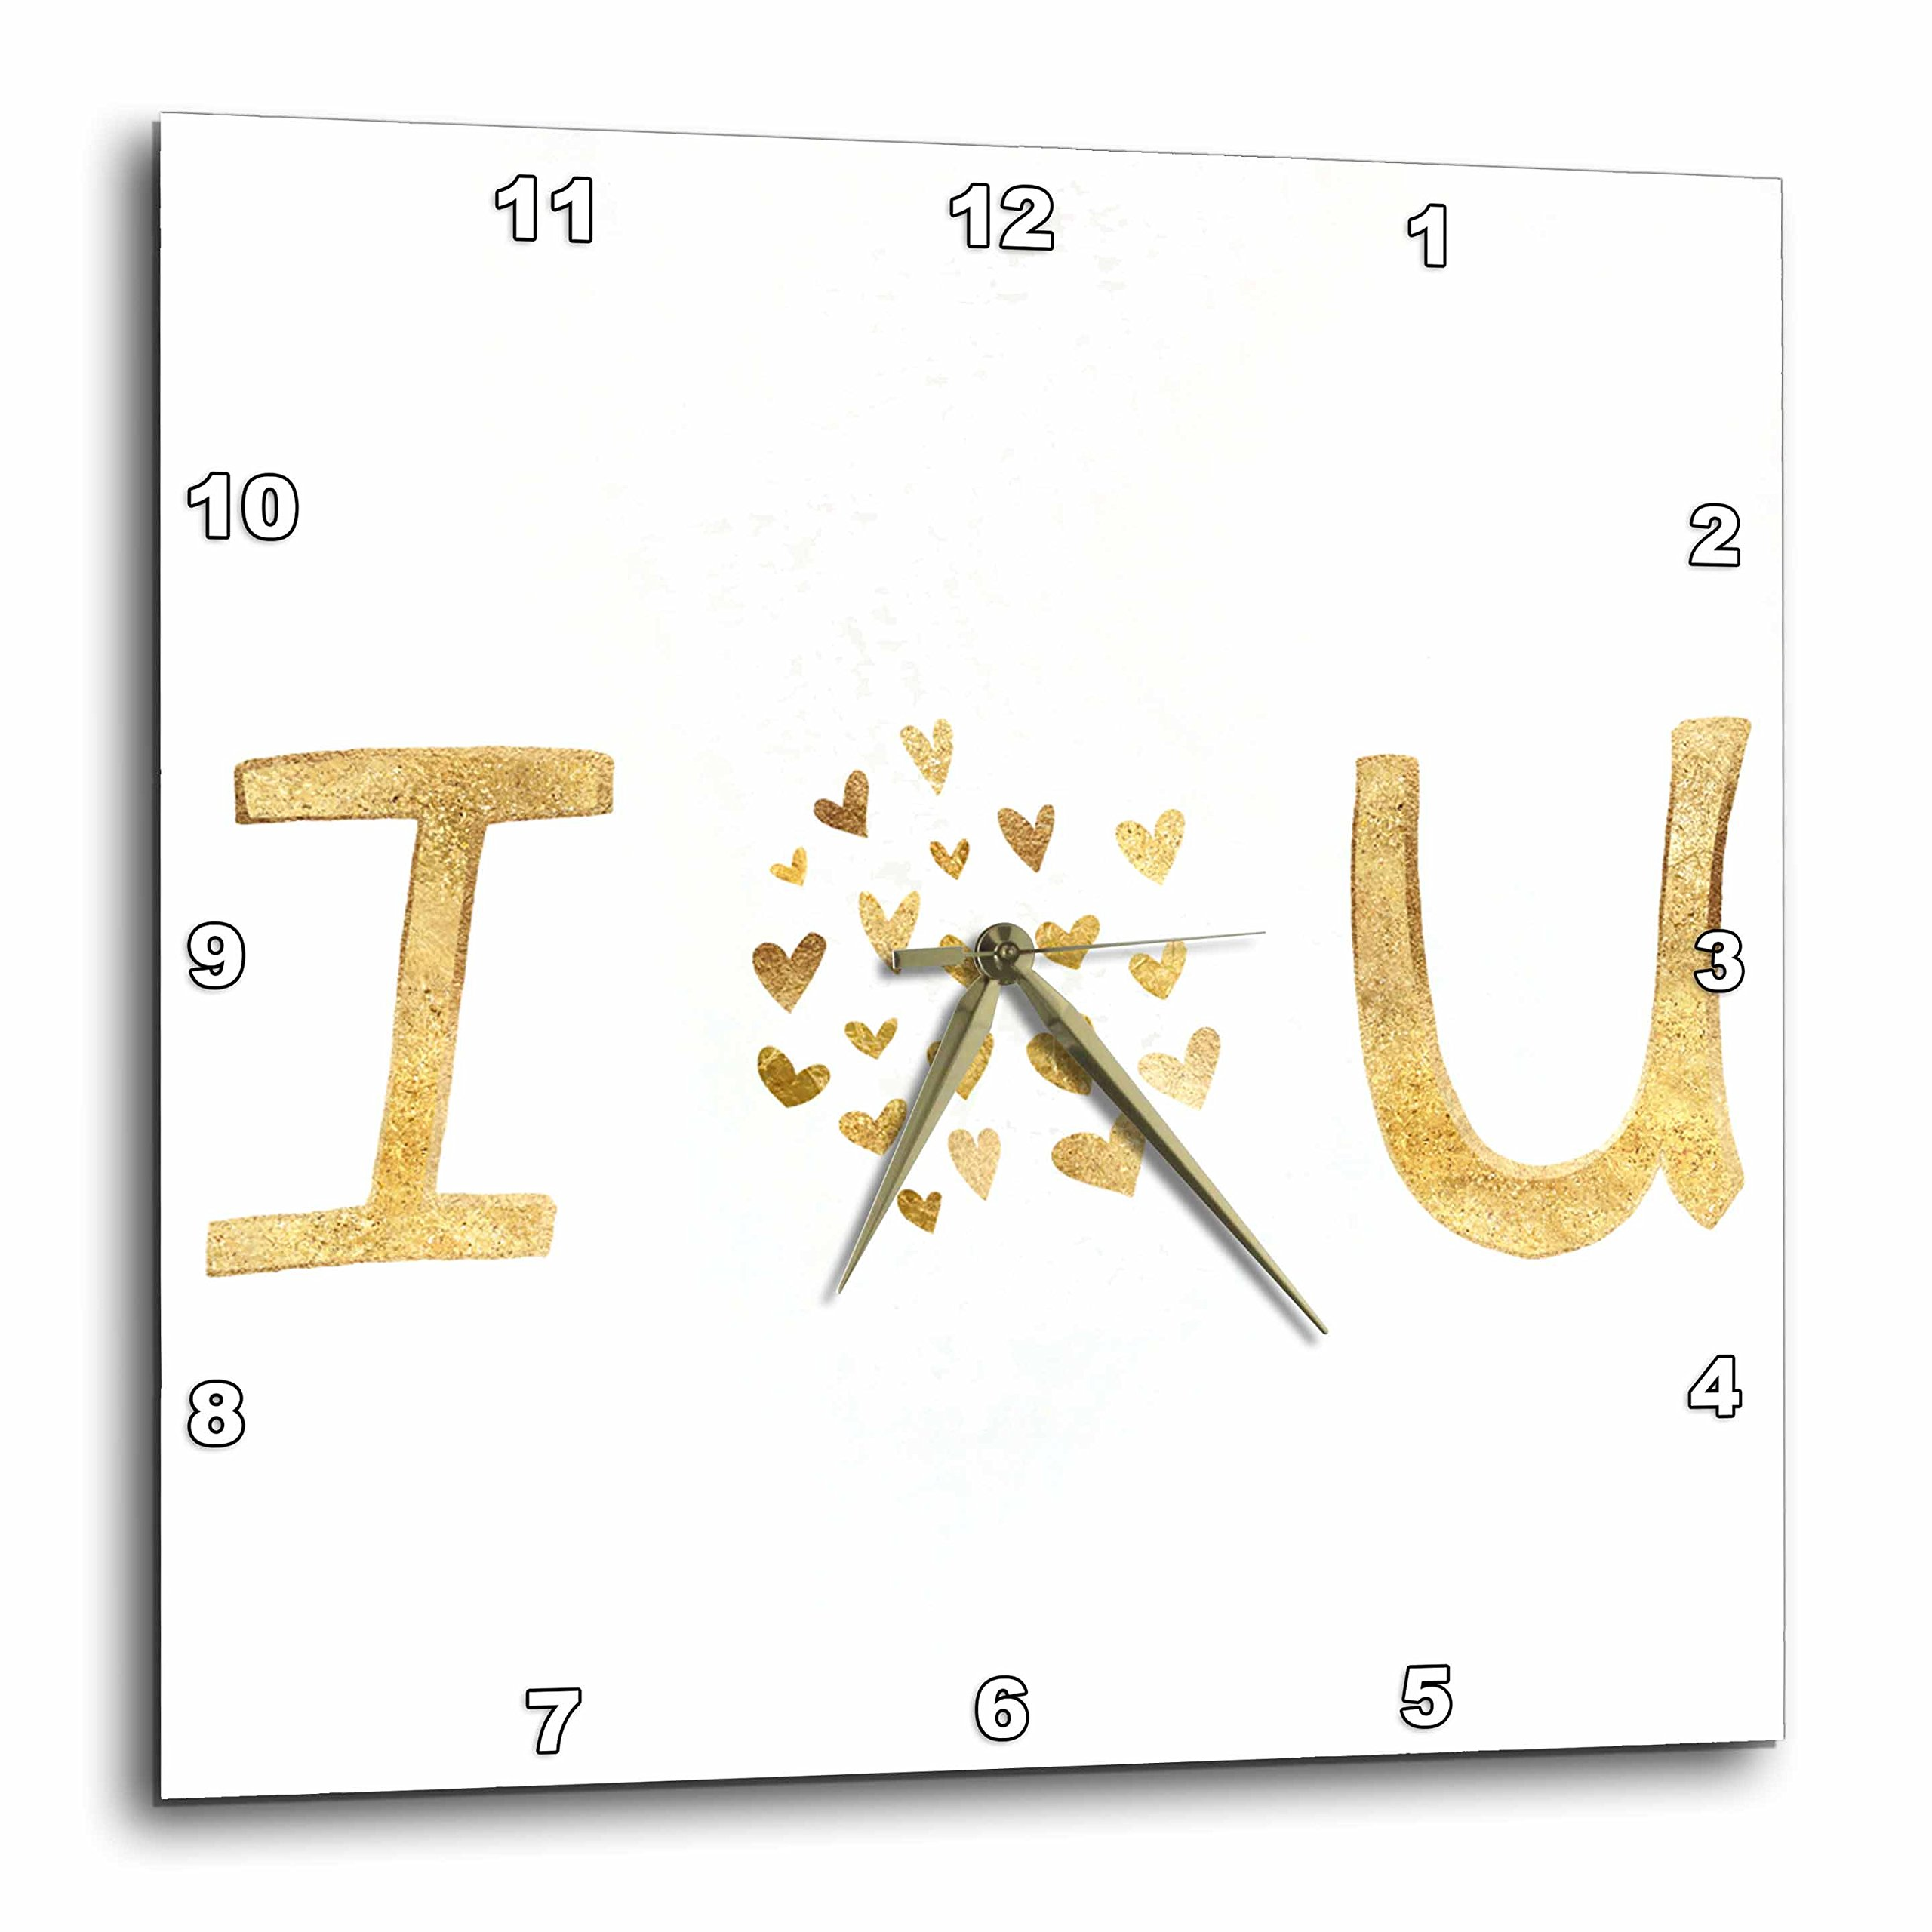 3dRose PS Inspiration - Gold I Love You Hearts - 15x15 Wall Clock (dpp_280746_3)